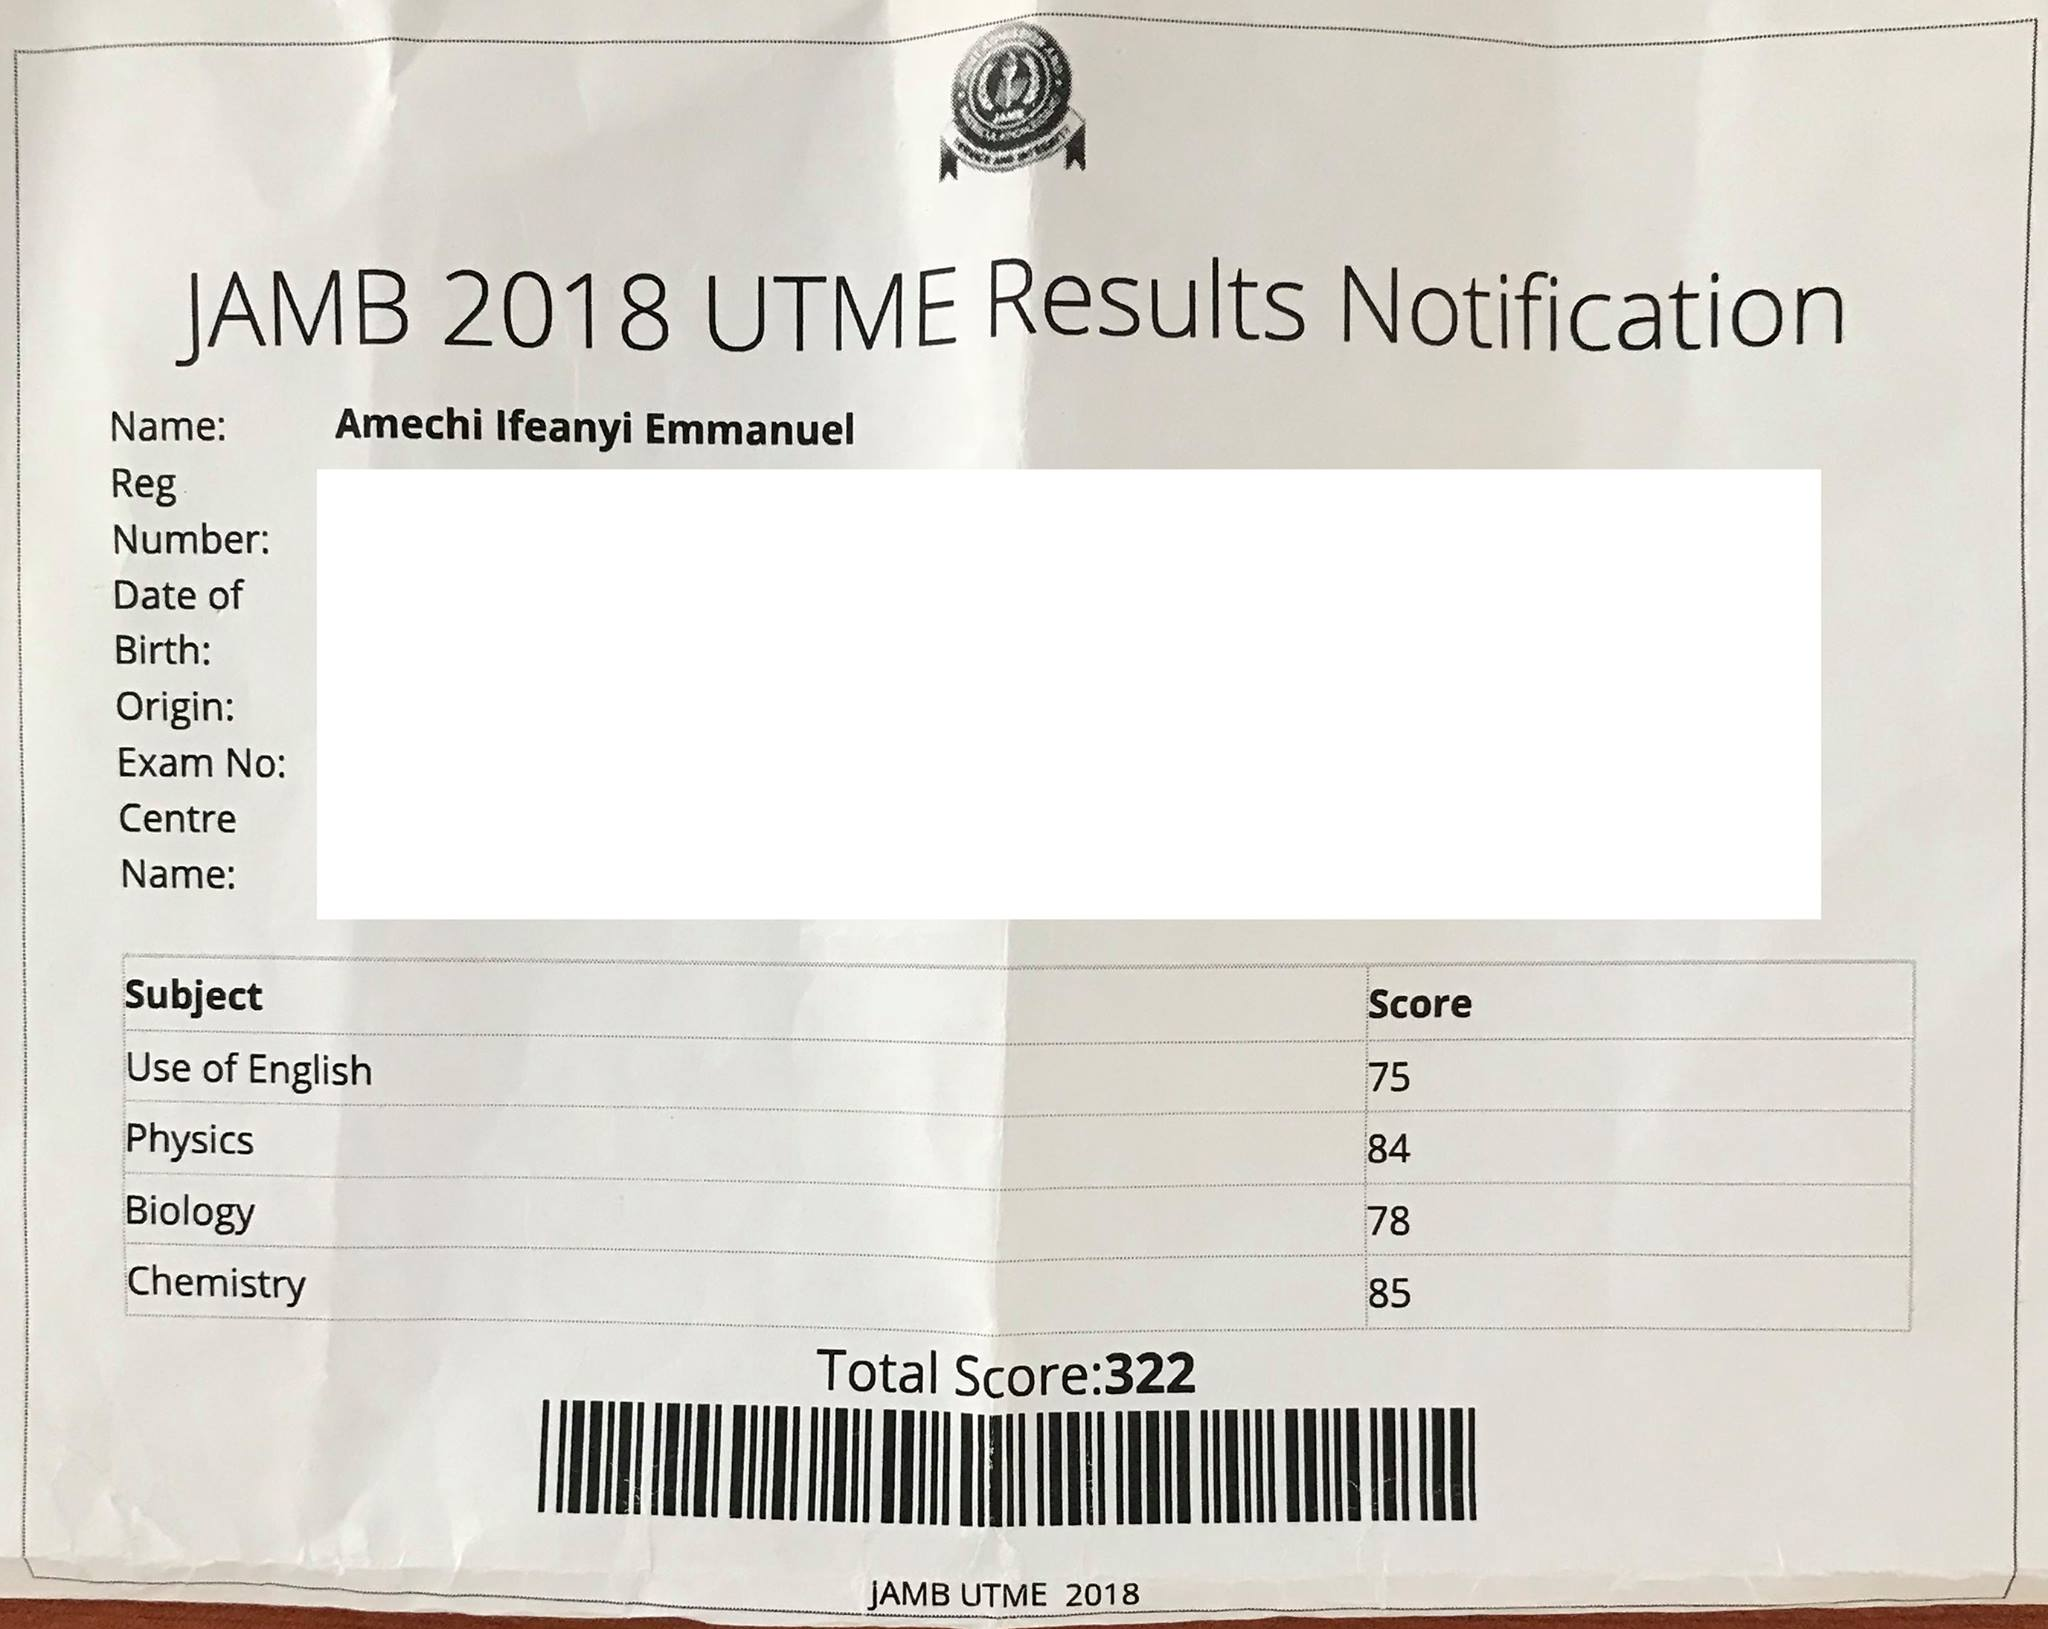 Grundtvig Class of 2018 Achieve JAMB Score of 322